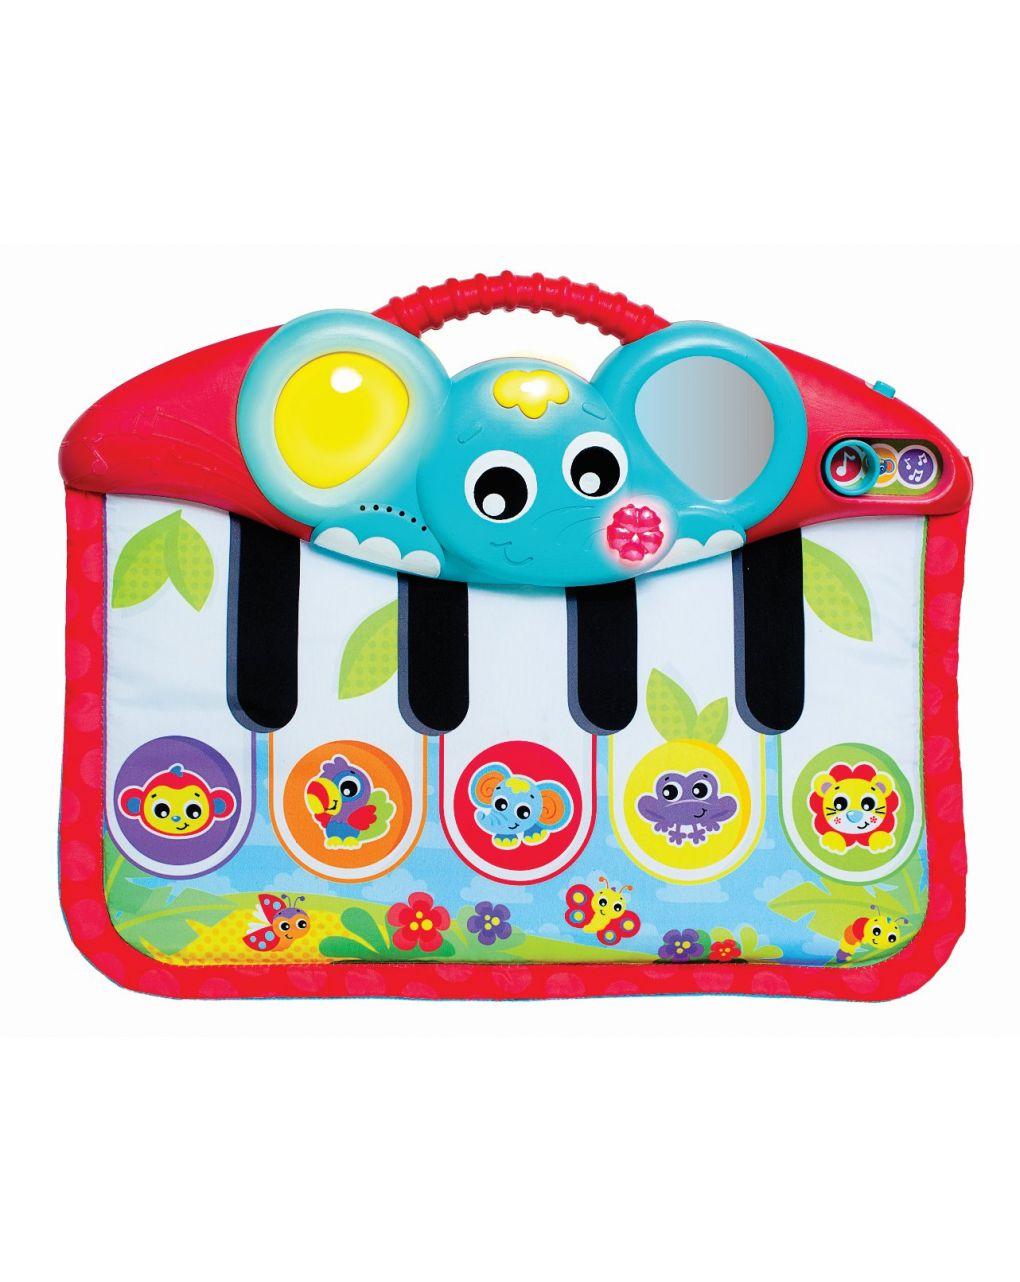 Playgro - music and lights piano & kick pad - Playgro